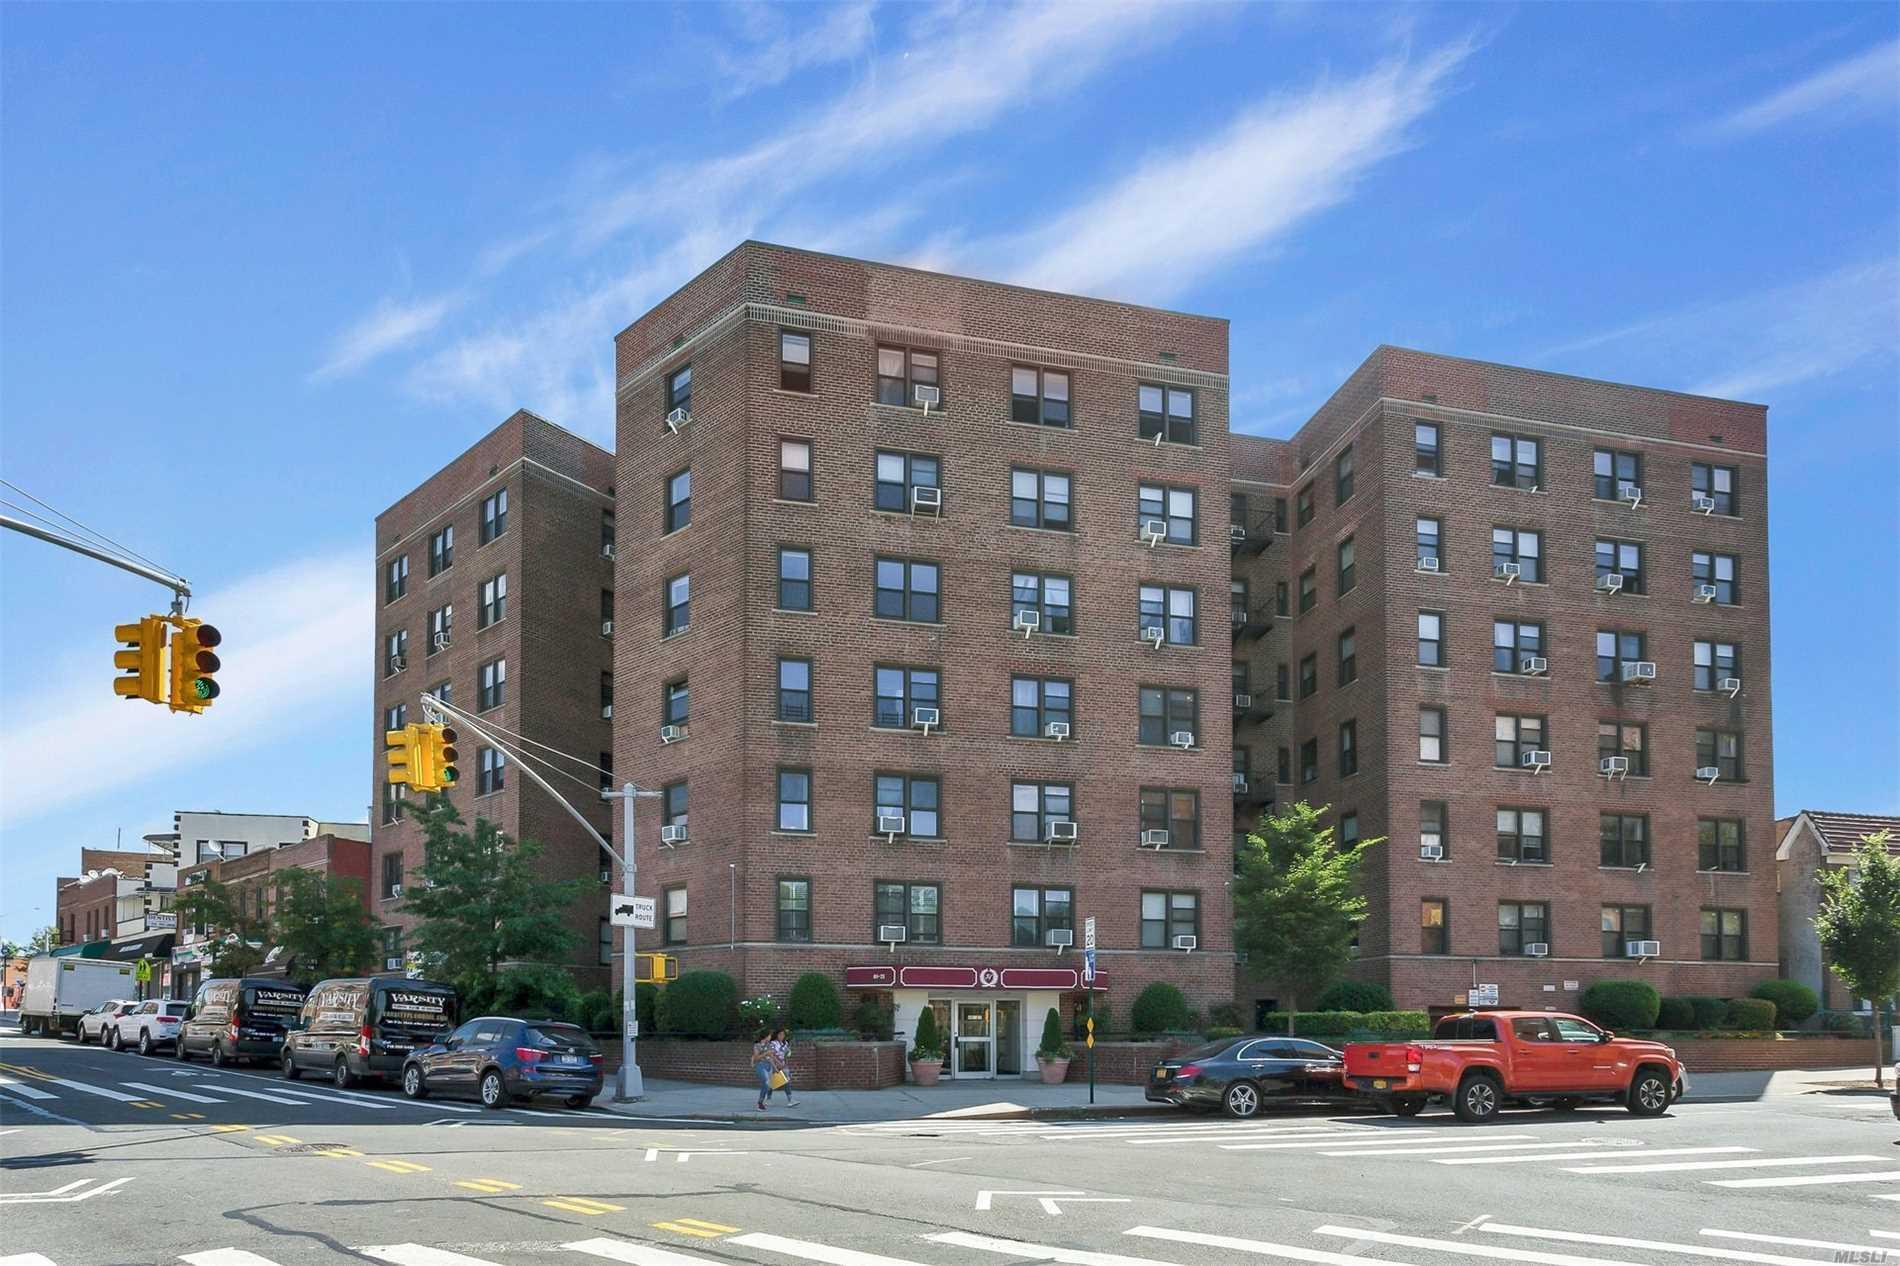 48-21 40 St, 3F - Sunnyside, New York